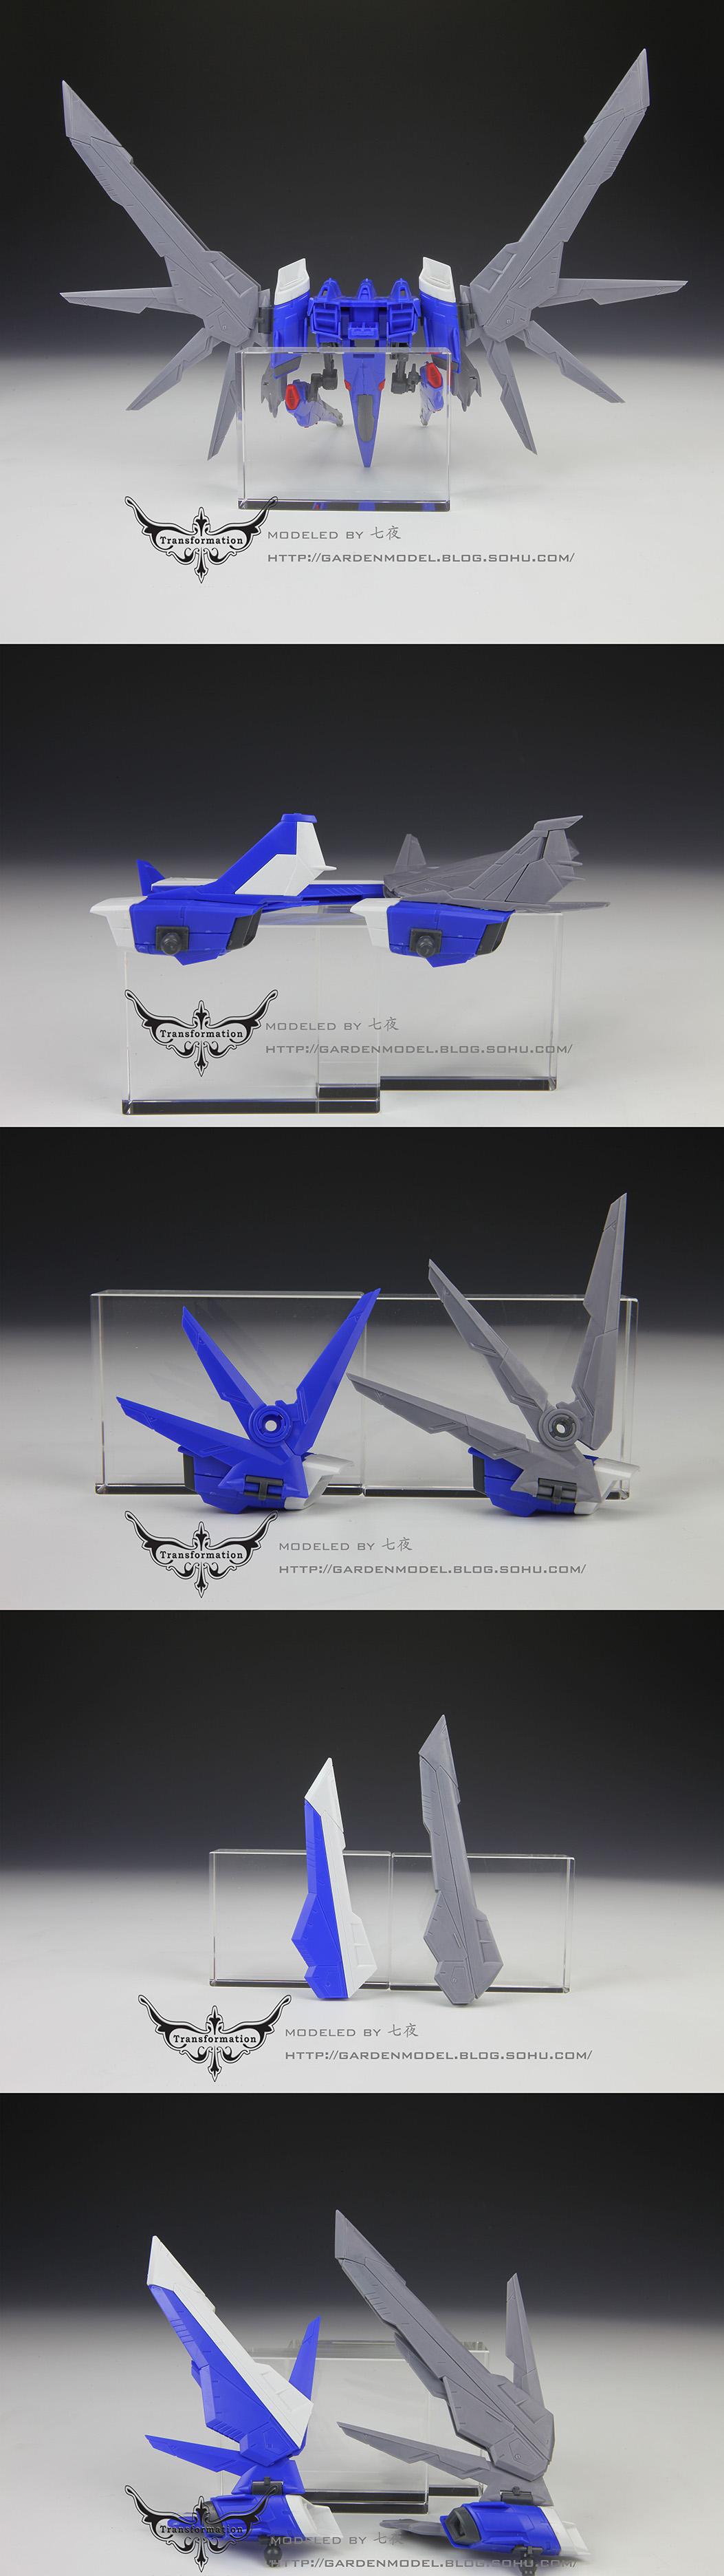 G93-buildstrike-tm-info-inask-017.jpg